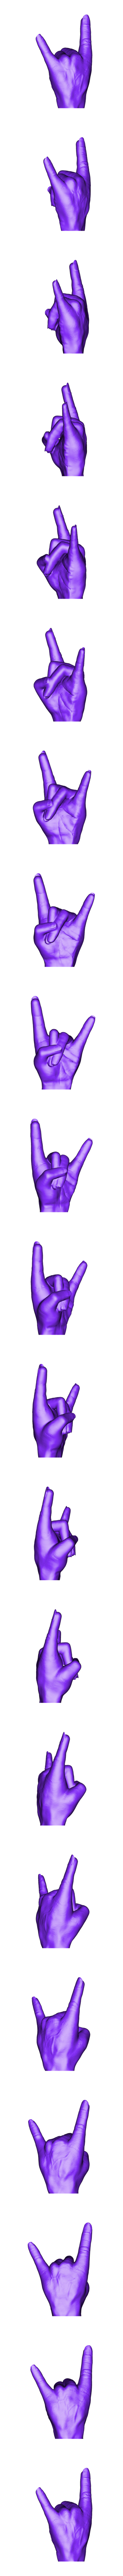 main hard rock.OBJ Download free OBJ file hand hard rock • 3D printer model, syl39